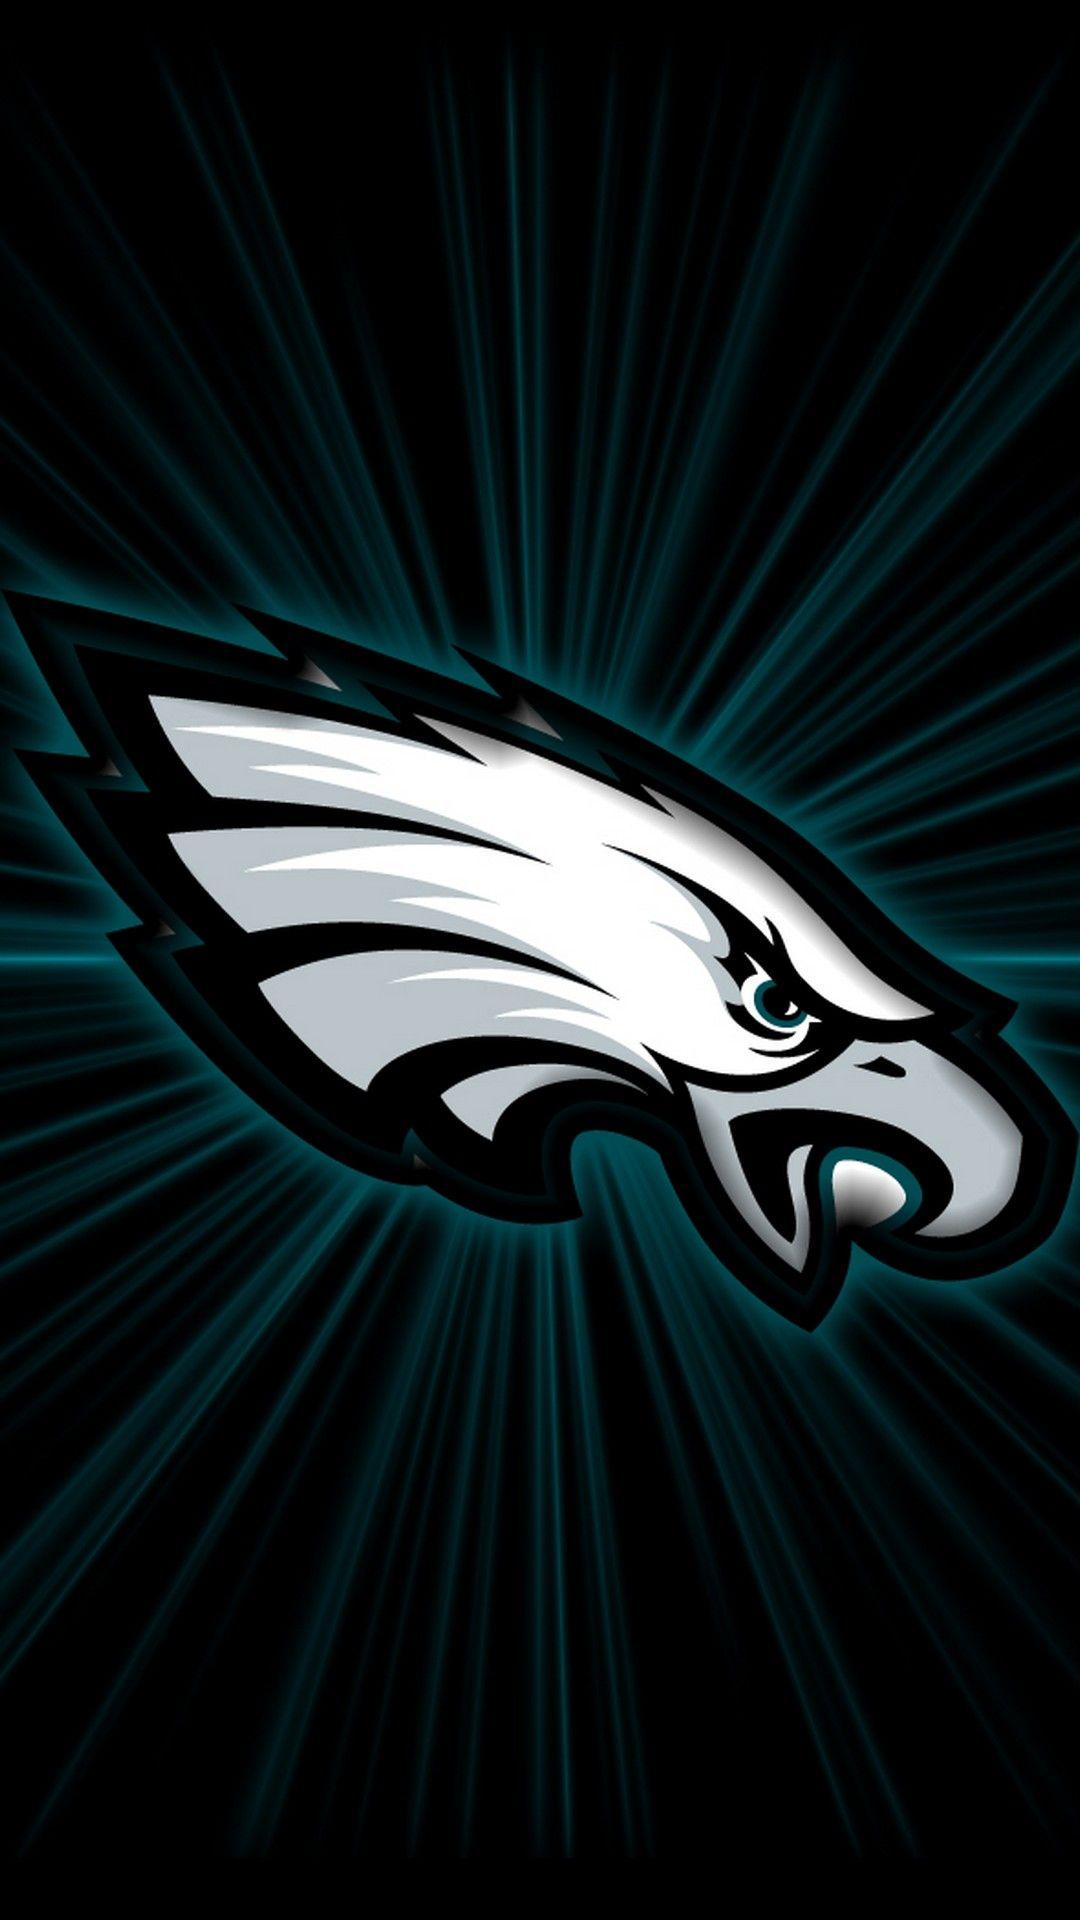 Philadelphia Eagles Iphone 6 Wallpaper 2021 Nfl Football Wallpapers Philadelphia Eagles Football Logo Philadelphia Eagles Wallpaper Philadelphia Eagles